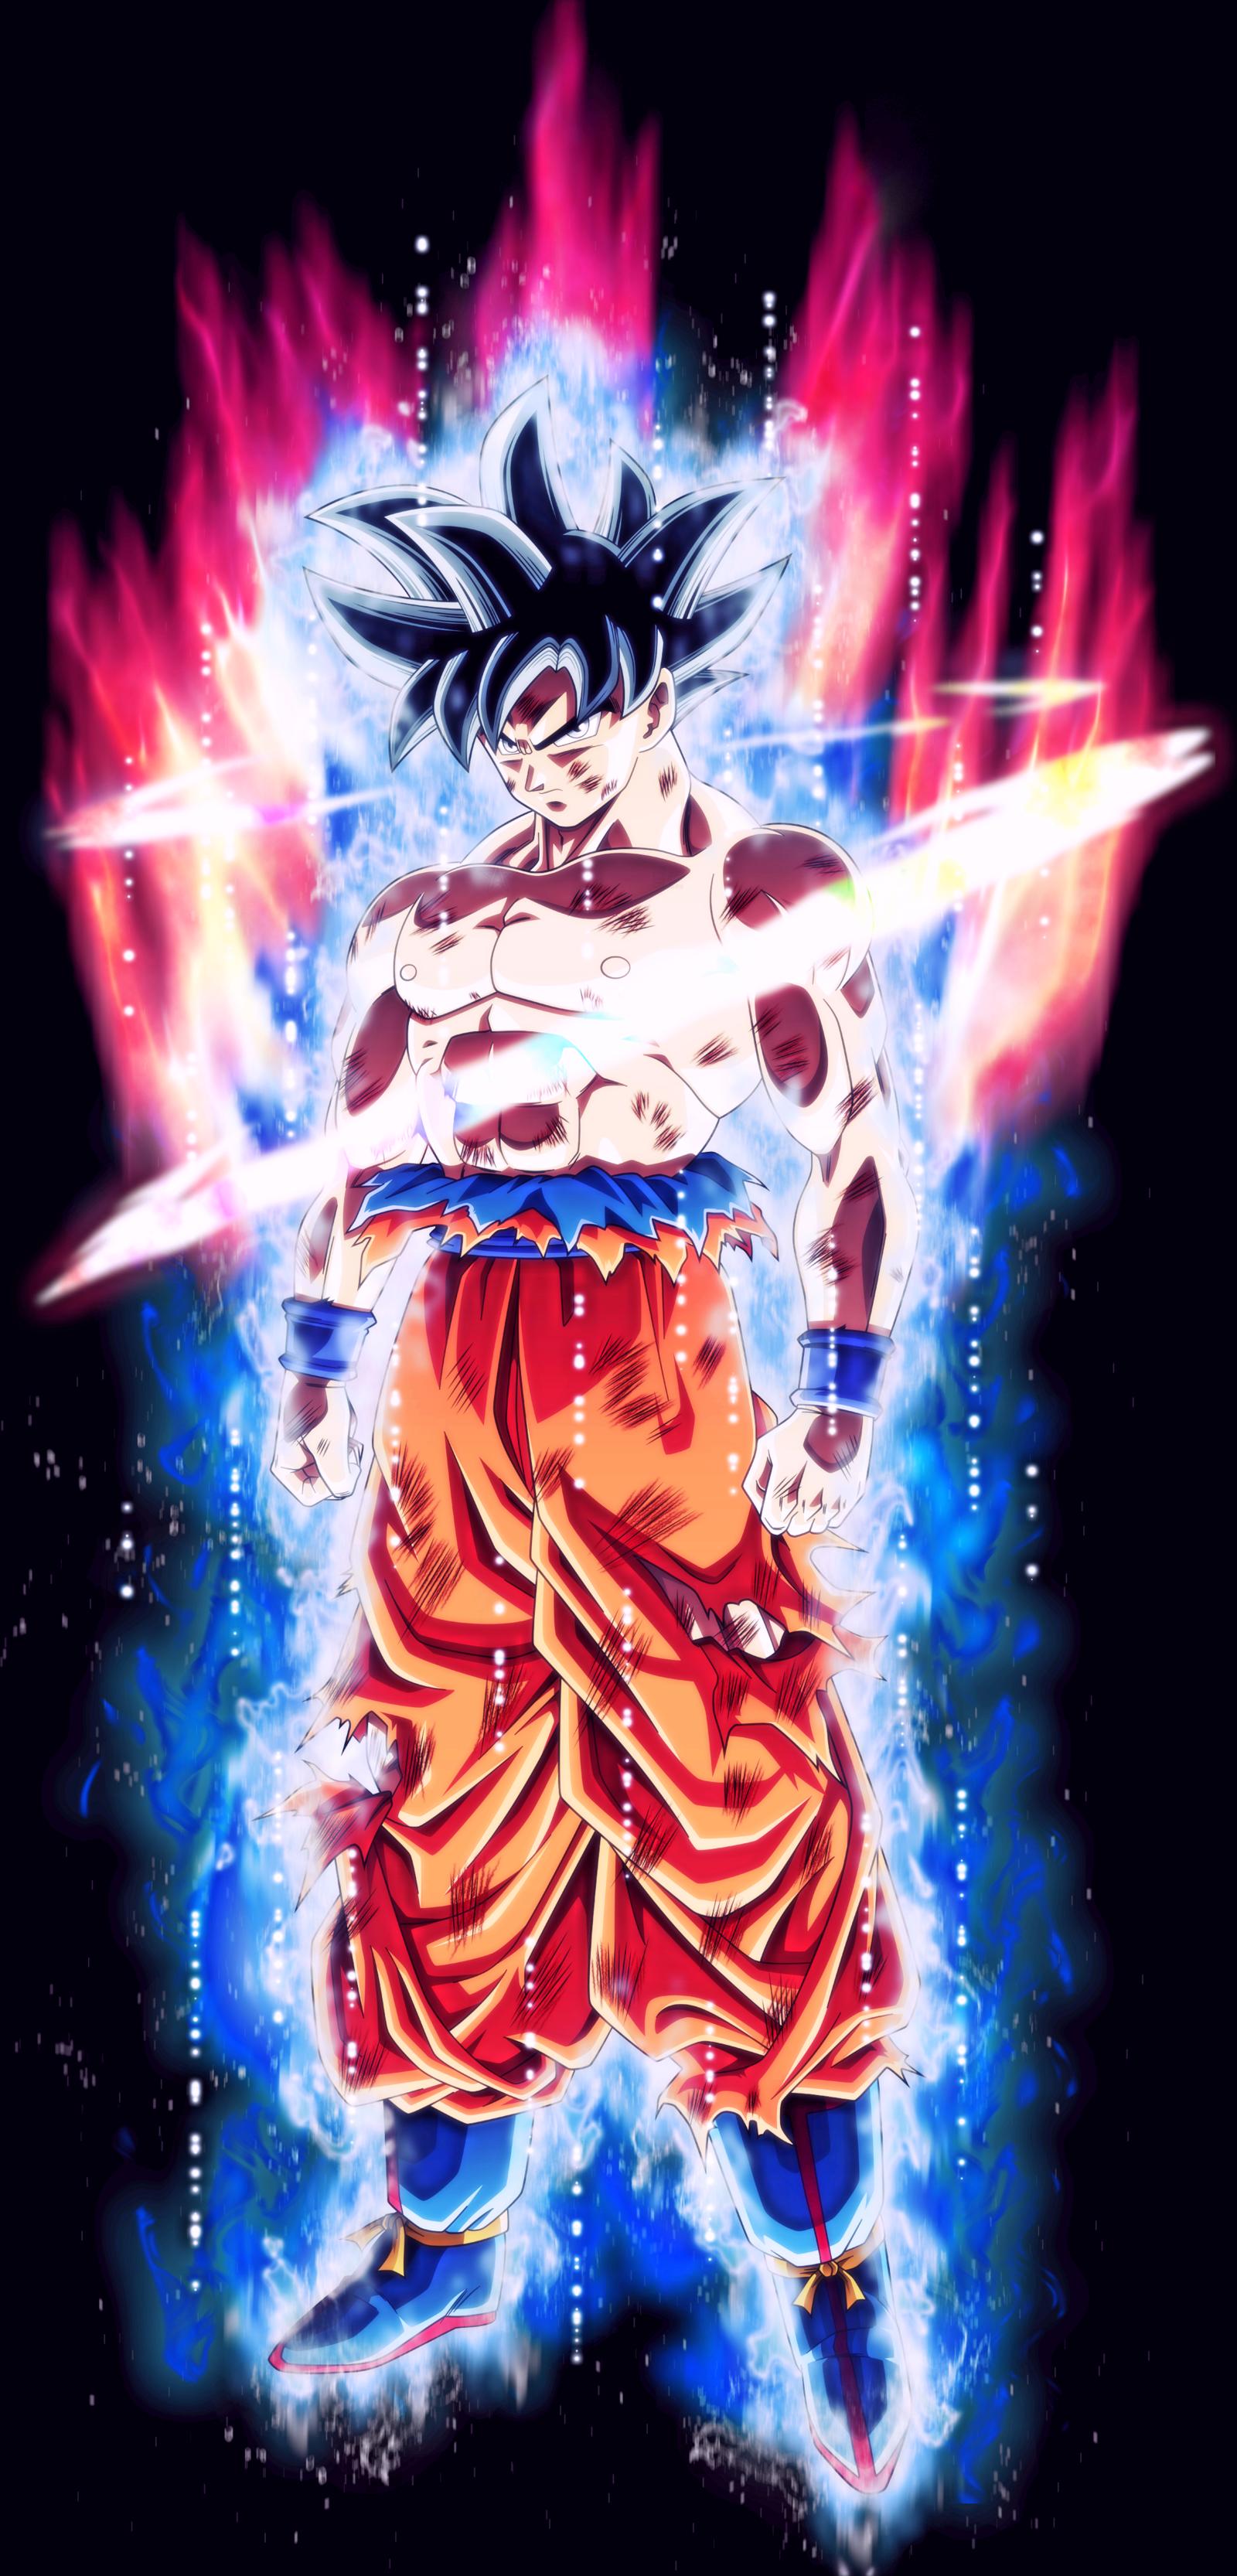 Dragon Ball Z Kai Final Chapters Dragon Ball Wallpapers Anime Dragon Ball Super Dragon Ball Wallpaper Iphone